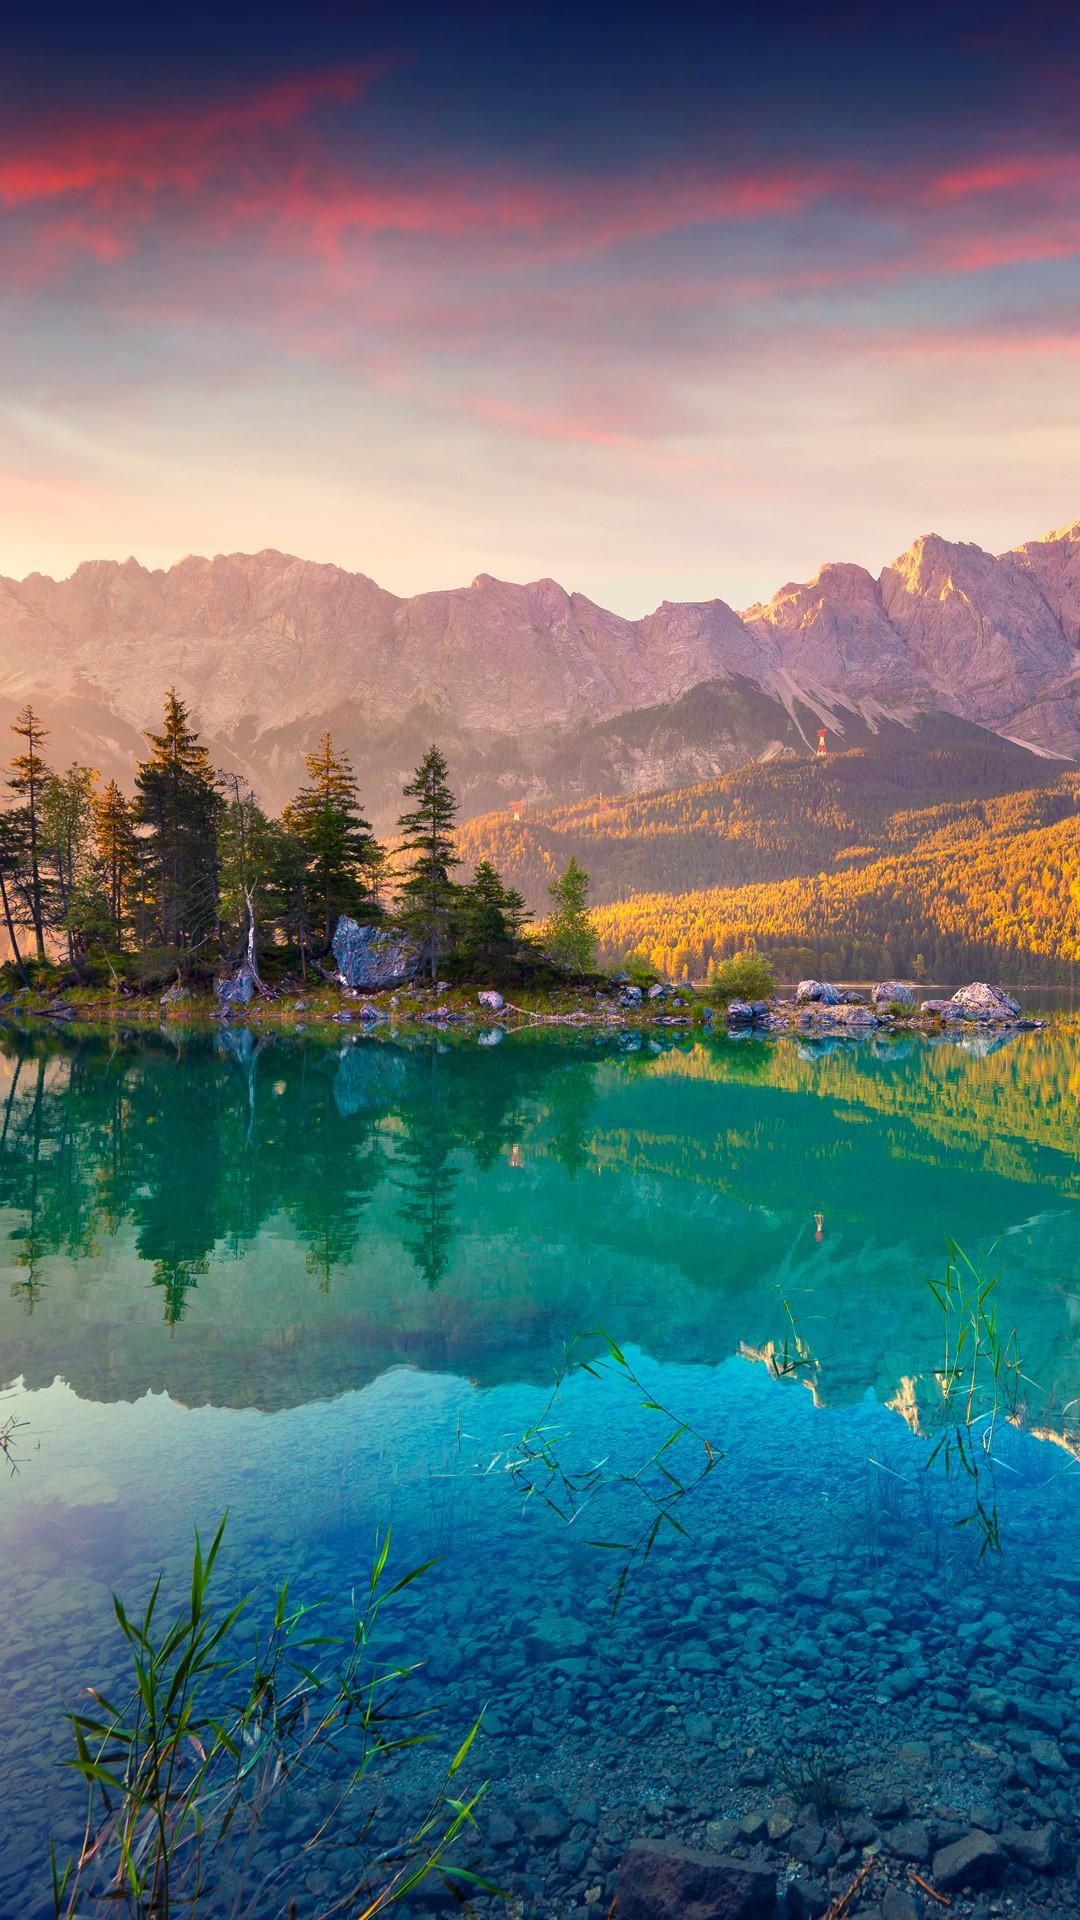 Summer Sunrise On The Eibsee Lake In German Alps  Germany